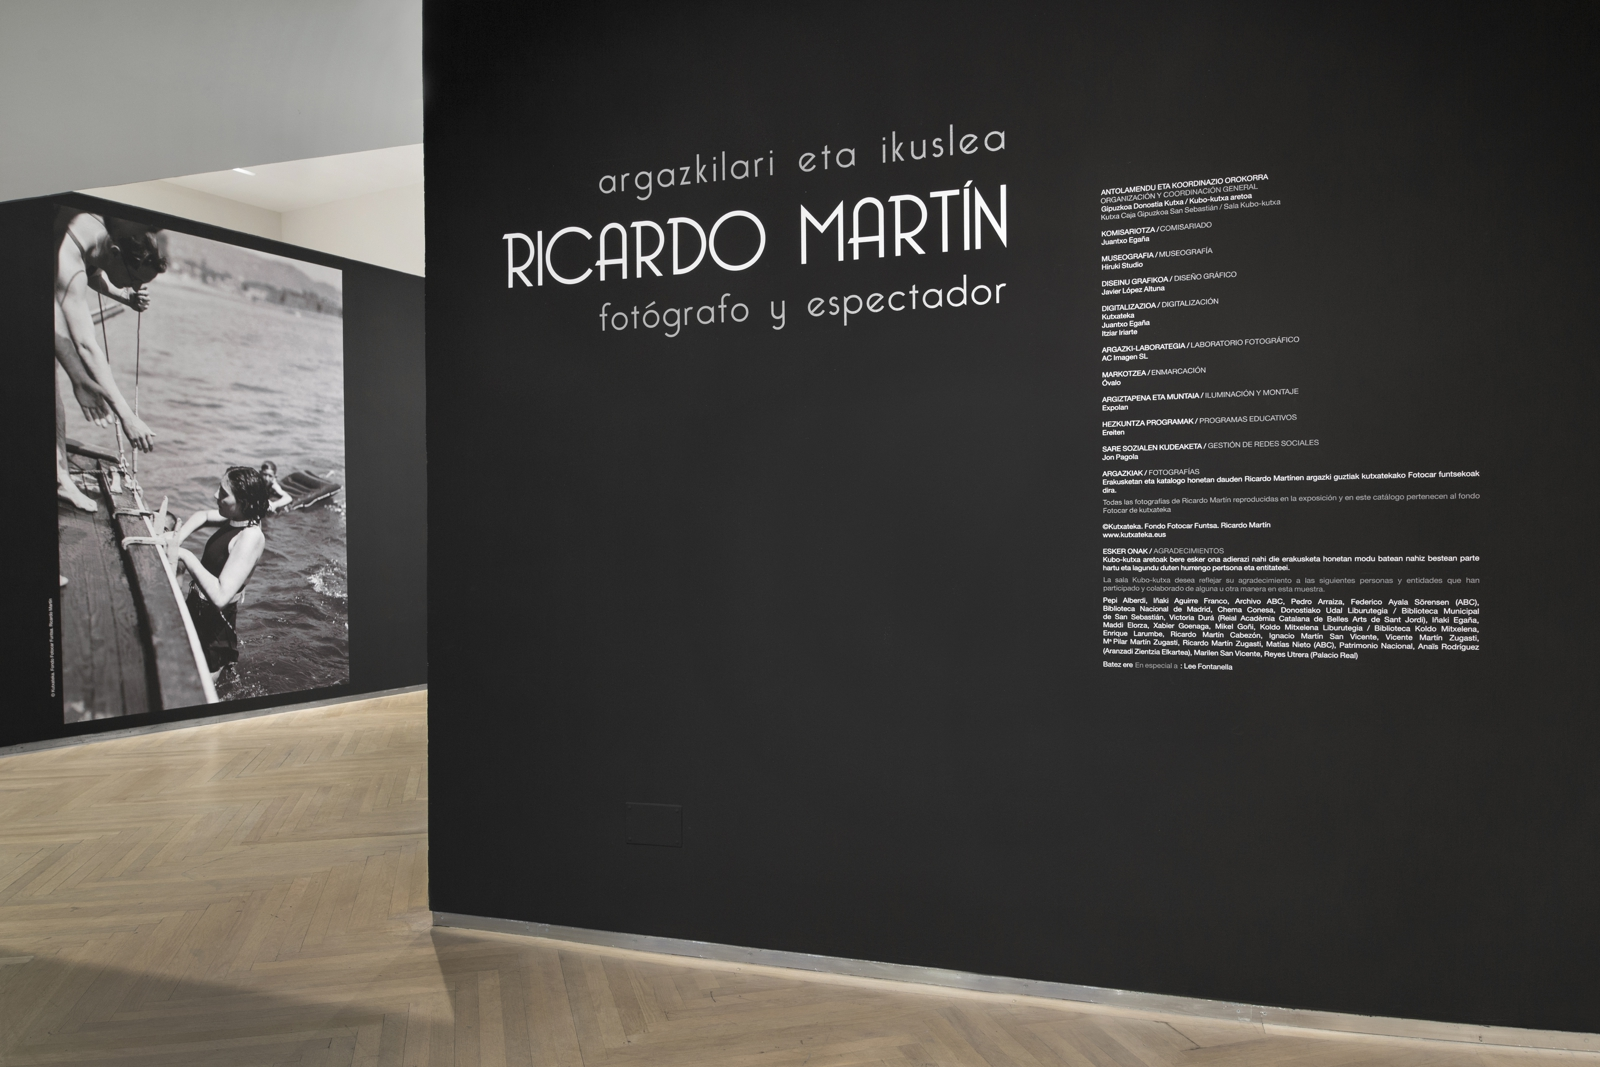 Ricardo_Martin_Hiruki Studio_+0021.JPG